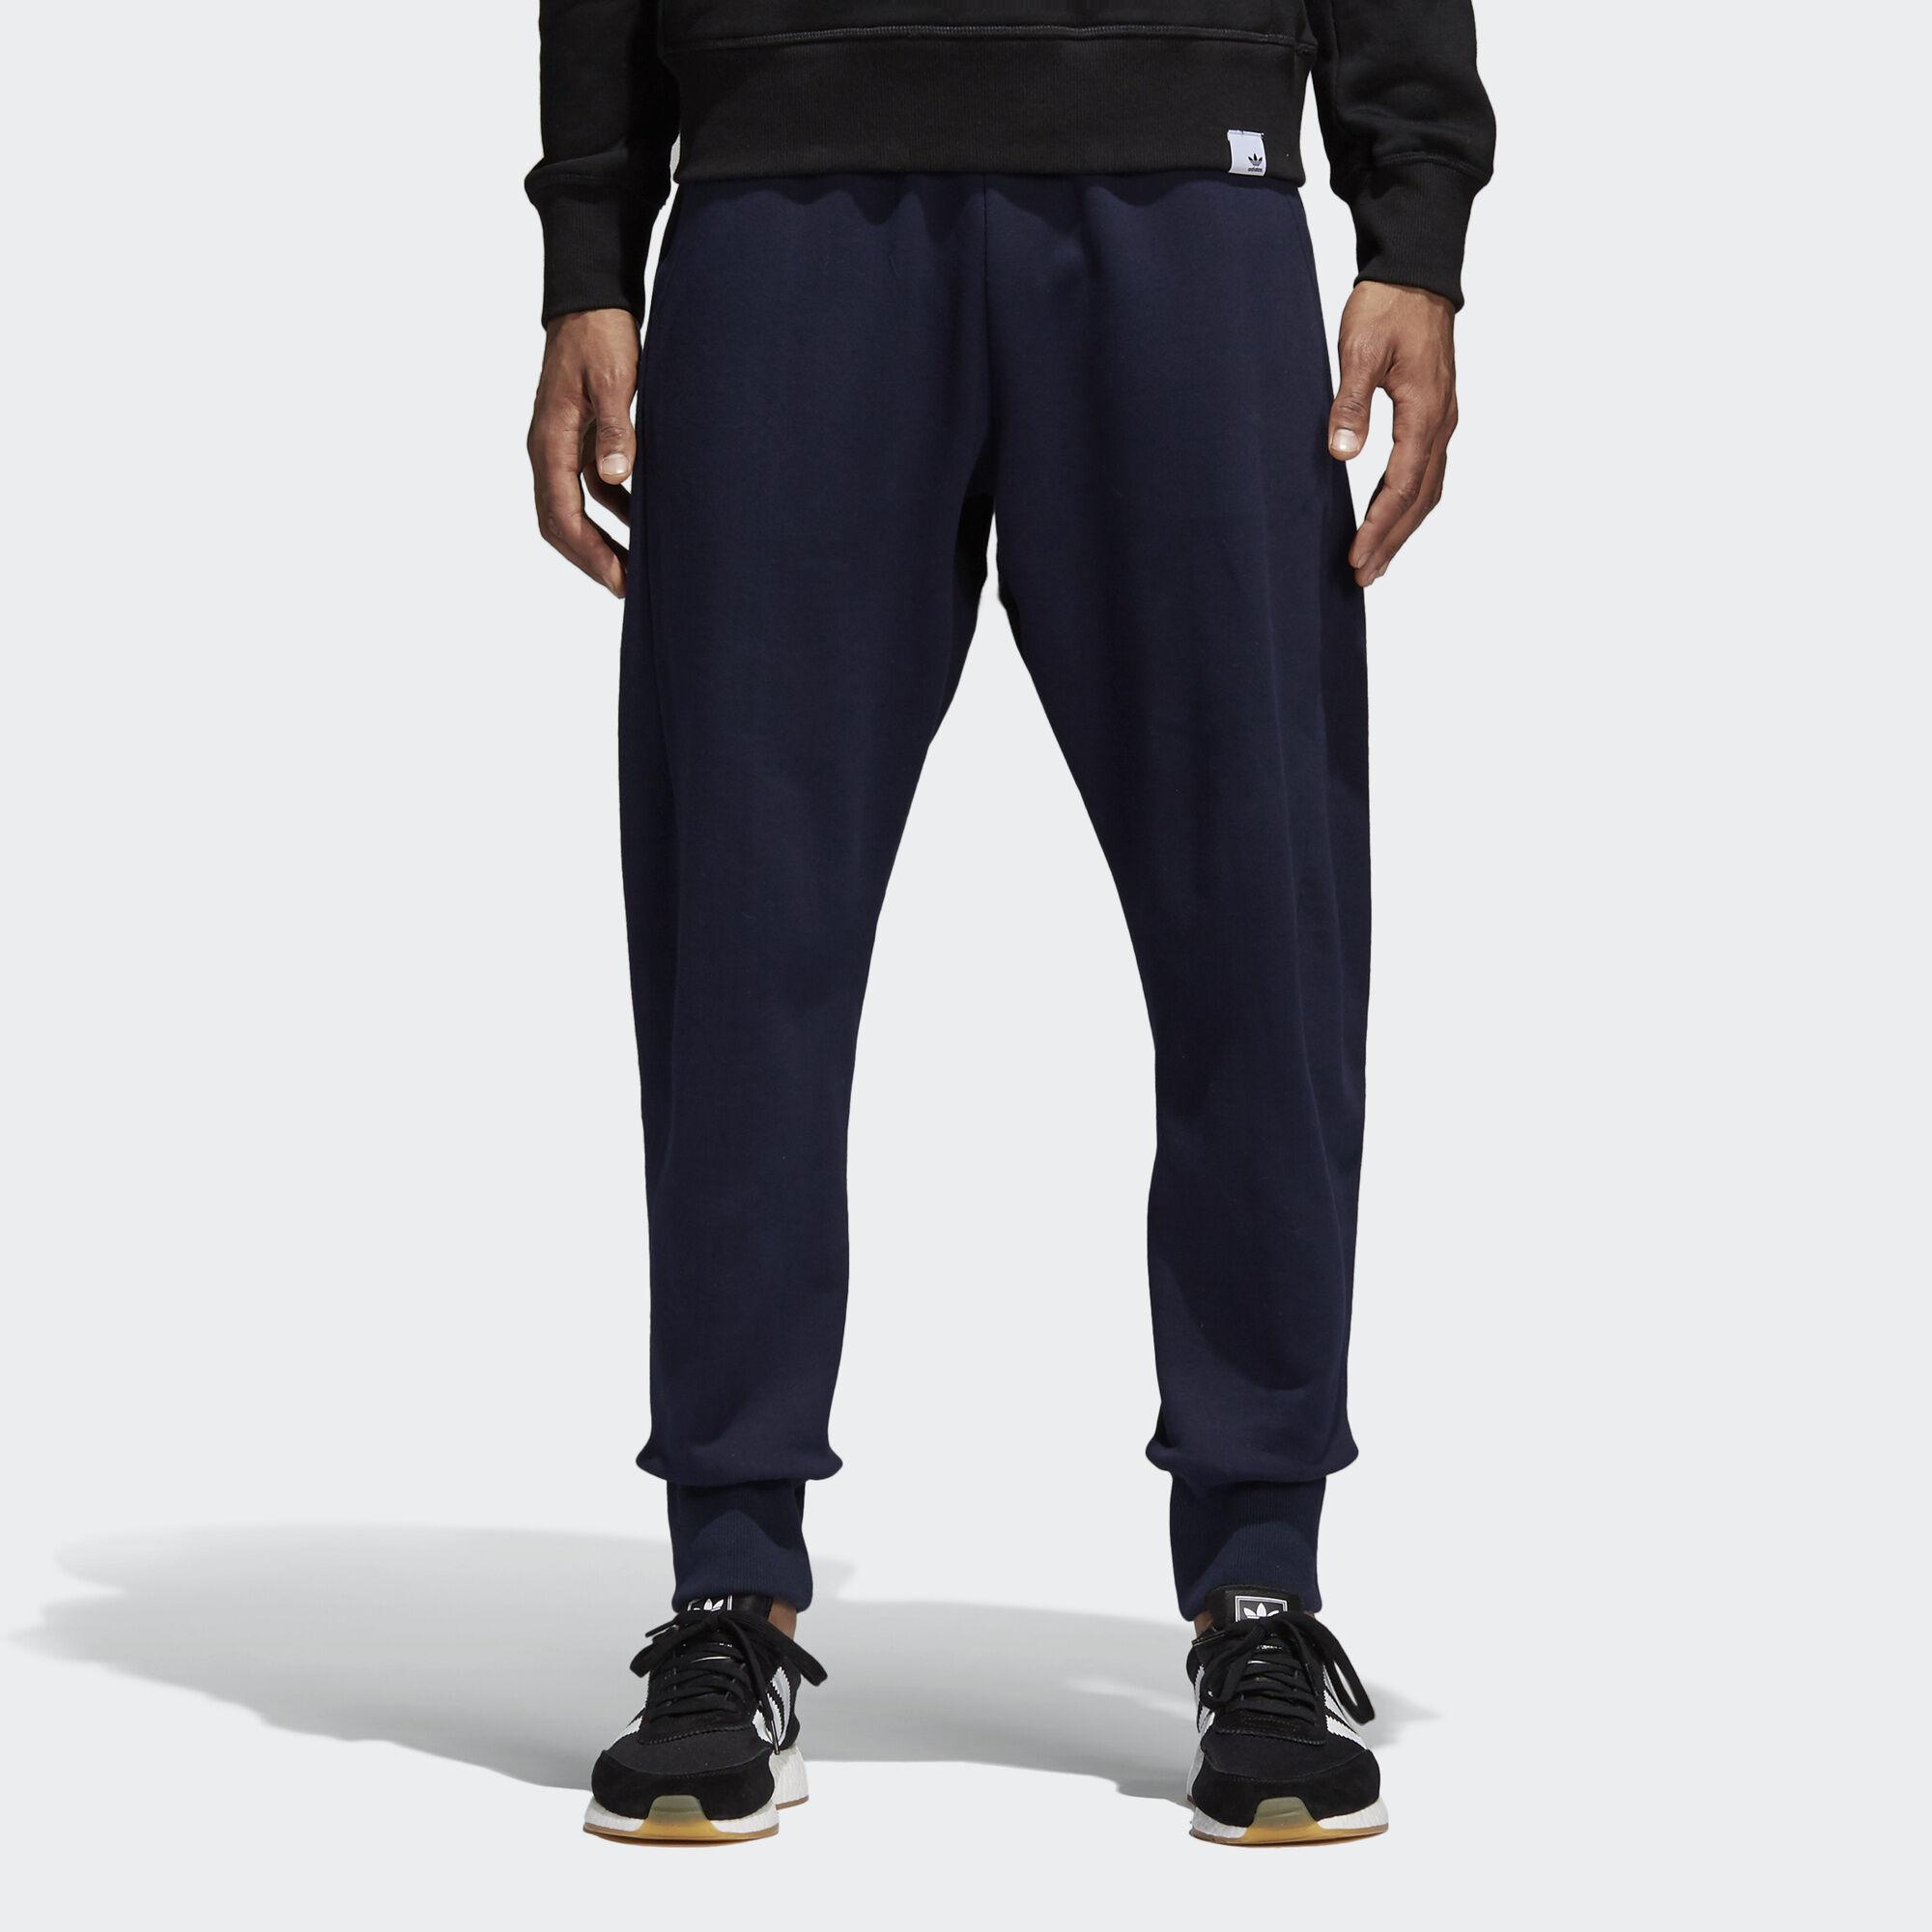 Shoe Montage Sweatpants Adidas